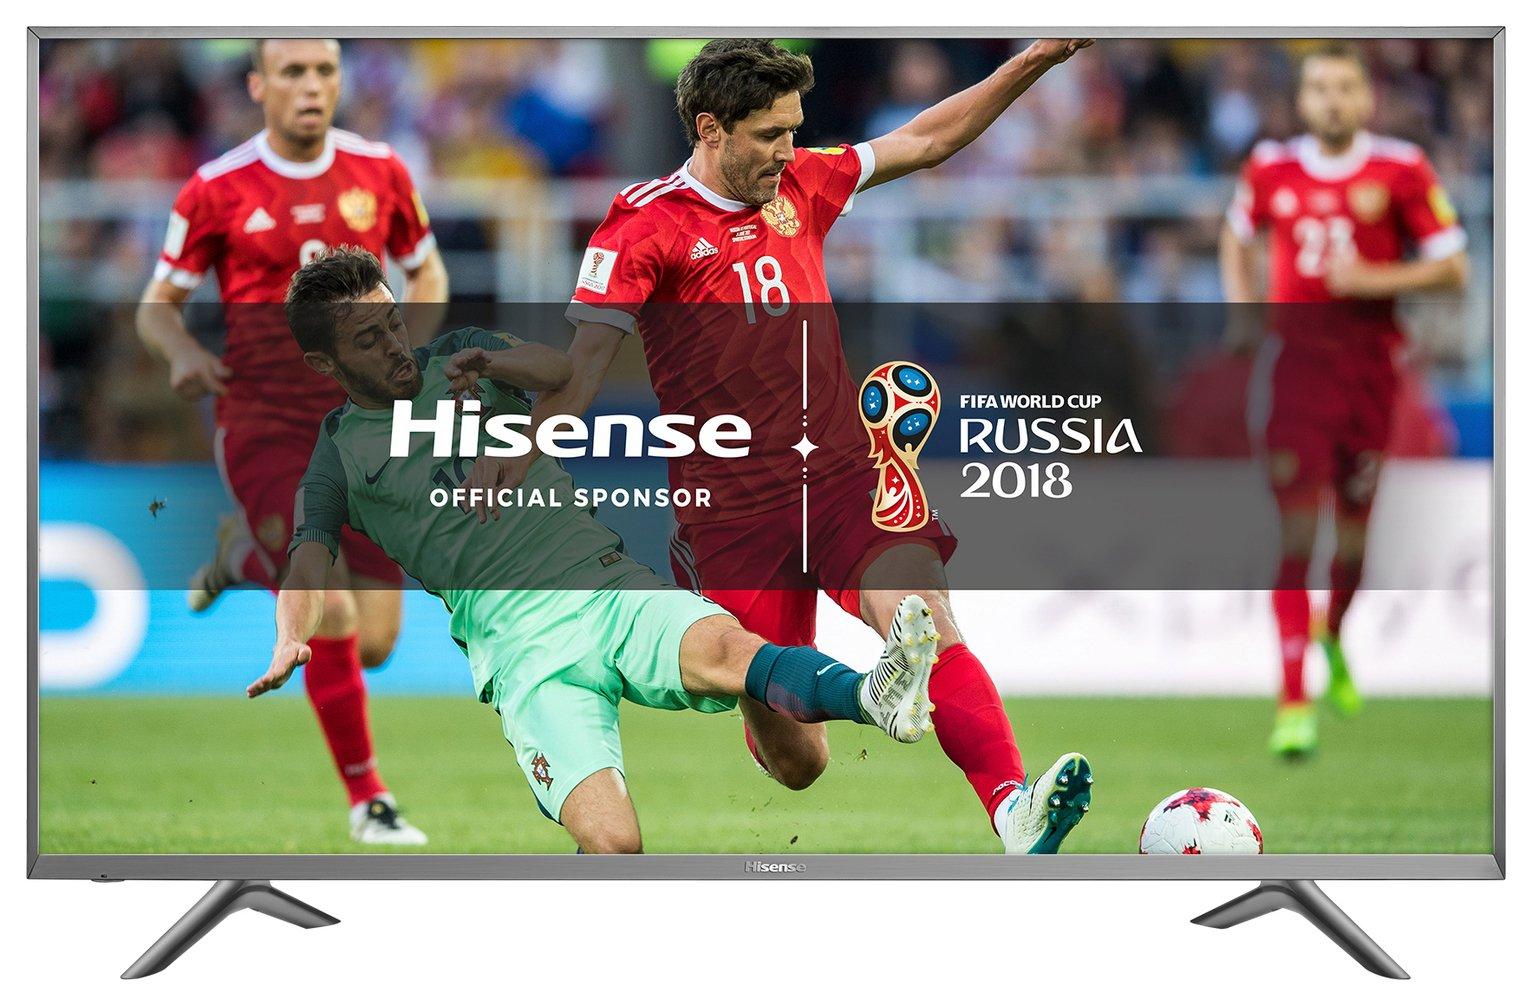 Hisense H65N5750 65 Inch 4K Ultra HD Smart TV with HDR